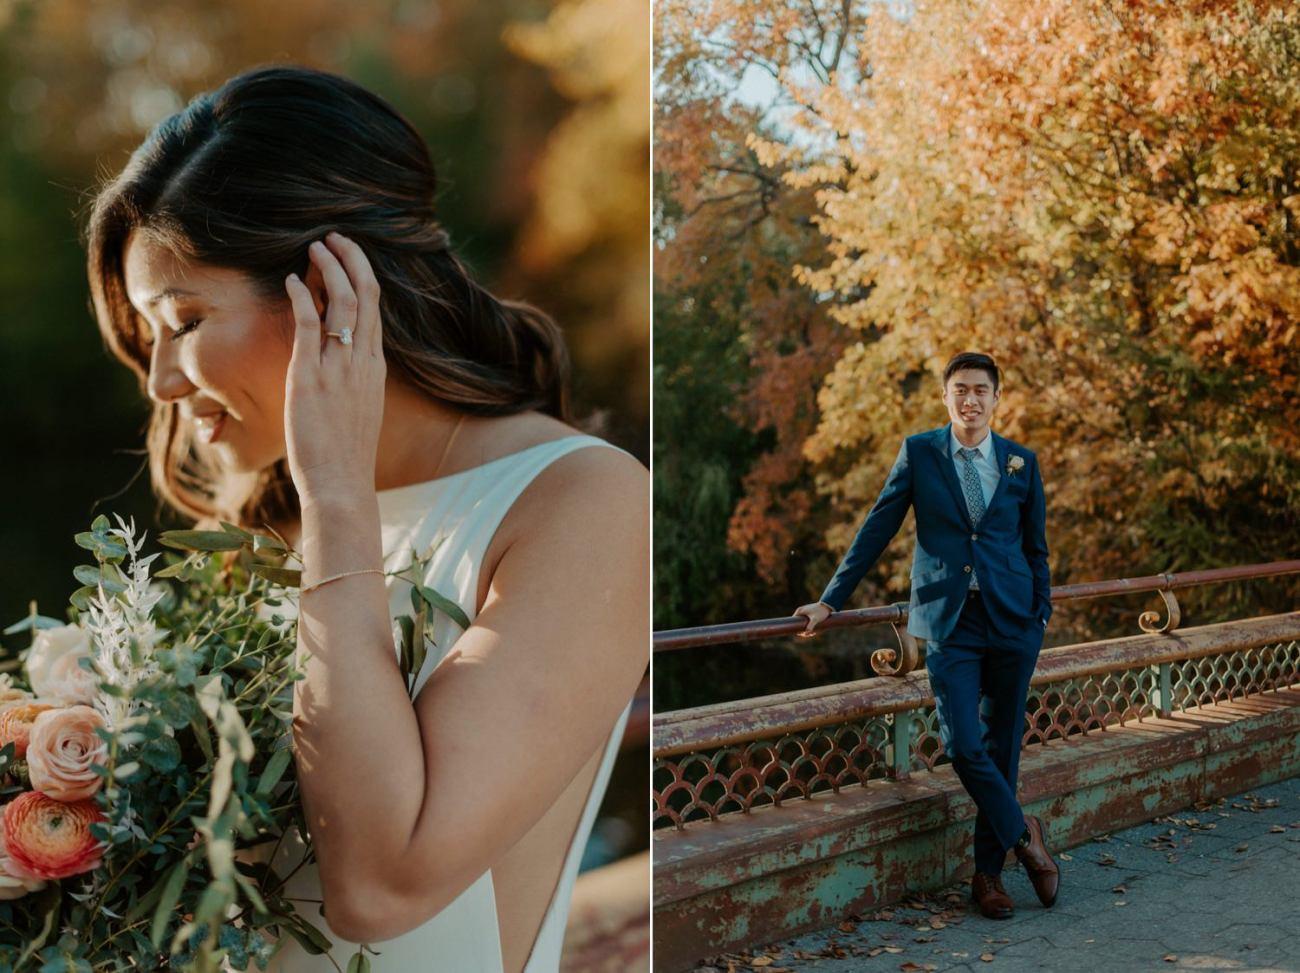 Prospect Park Brooklyn Wedding Fall Wedding In NYC New York Wedding Photographer Anais Possamai Photography 12